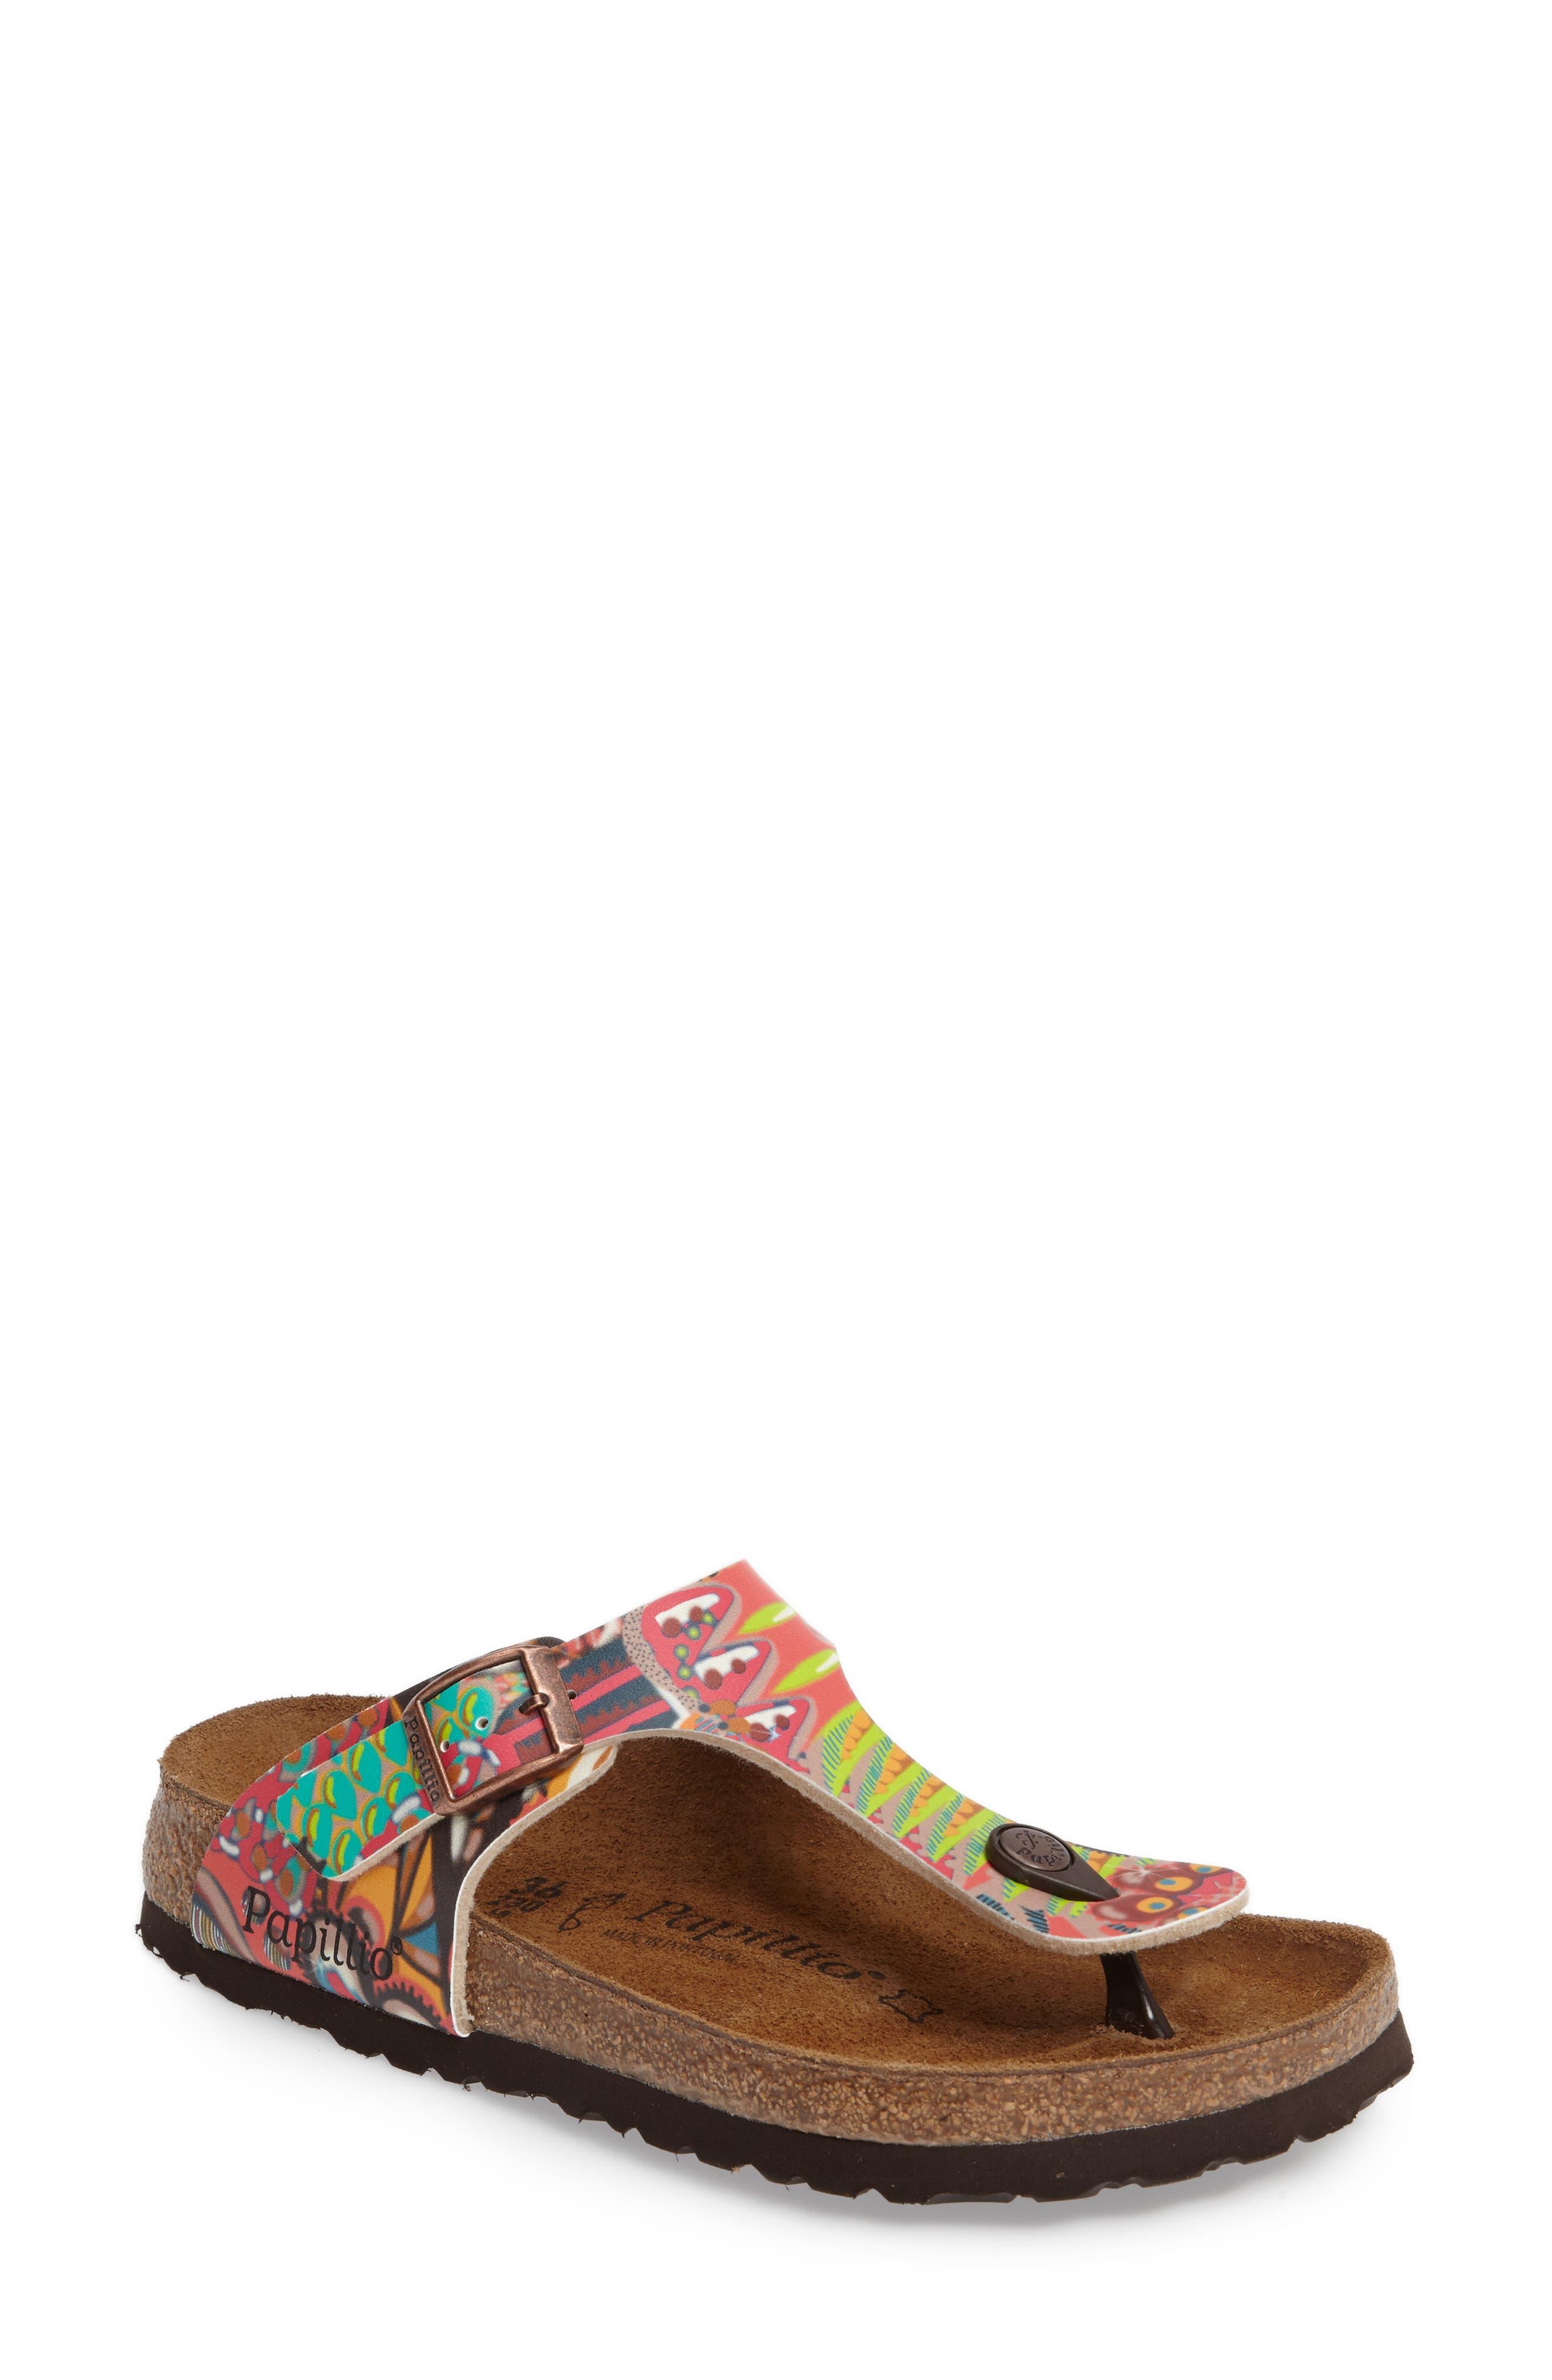 'Gizeh' Sandal,                         Main,                         color, Raspberry Multi